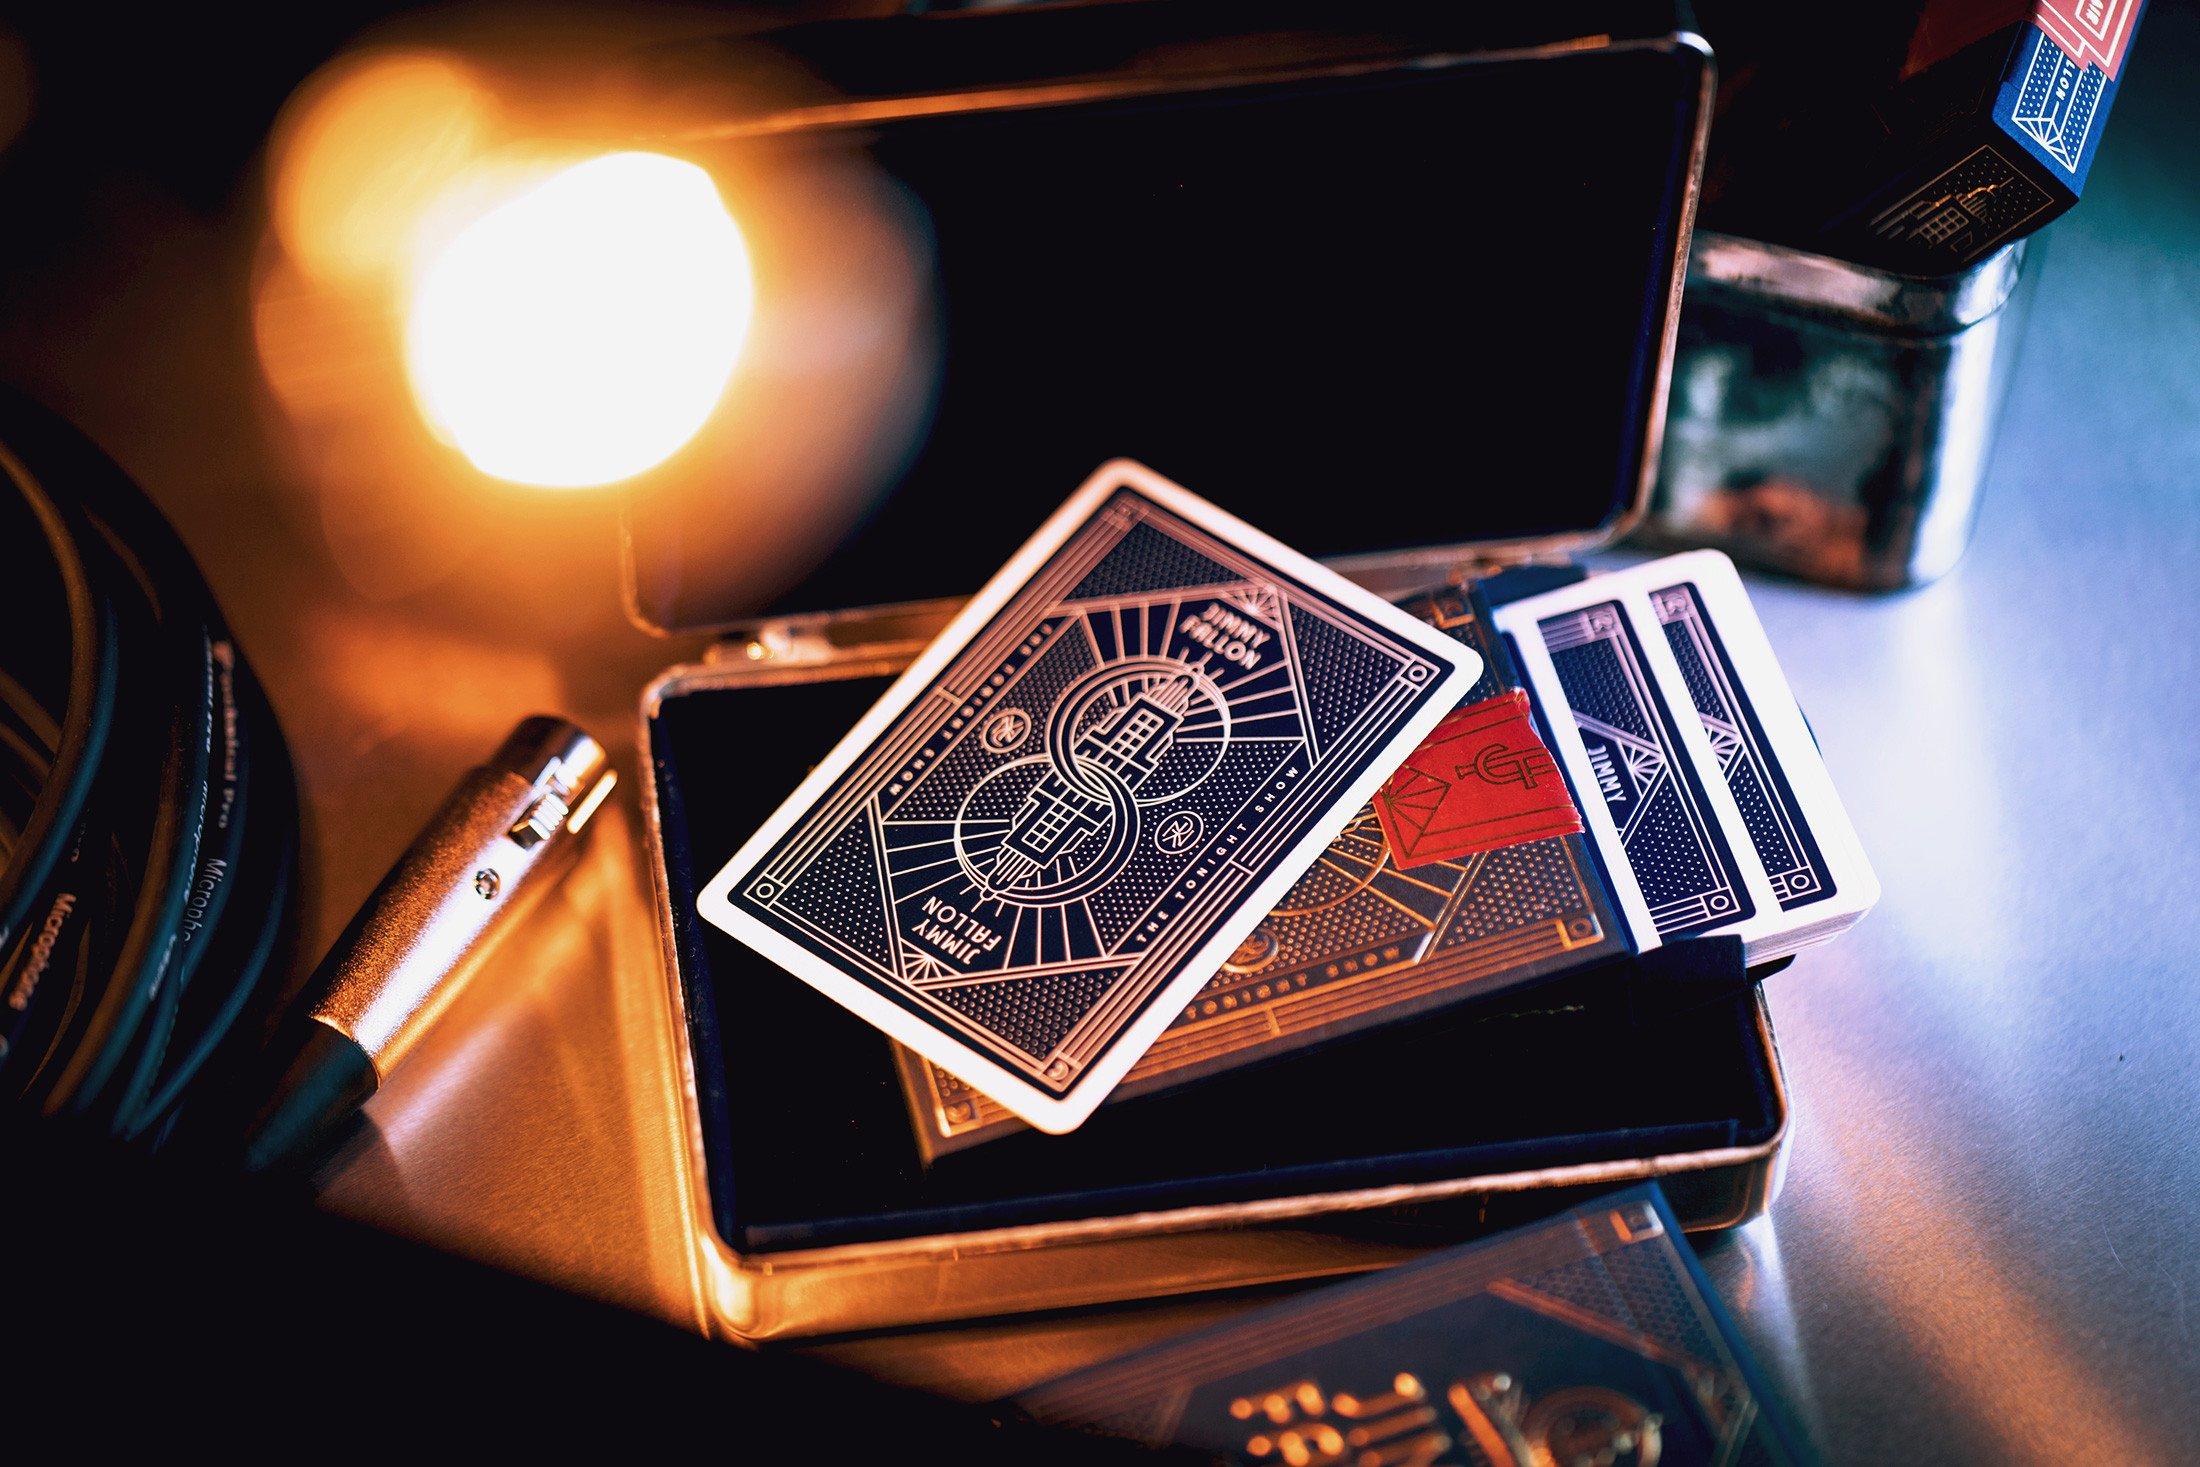 jimmy-fallon-playing-cards-12.jpg